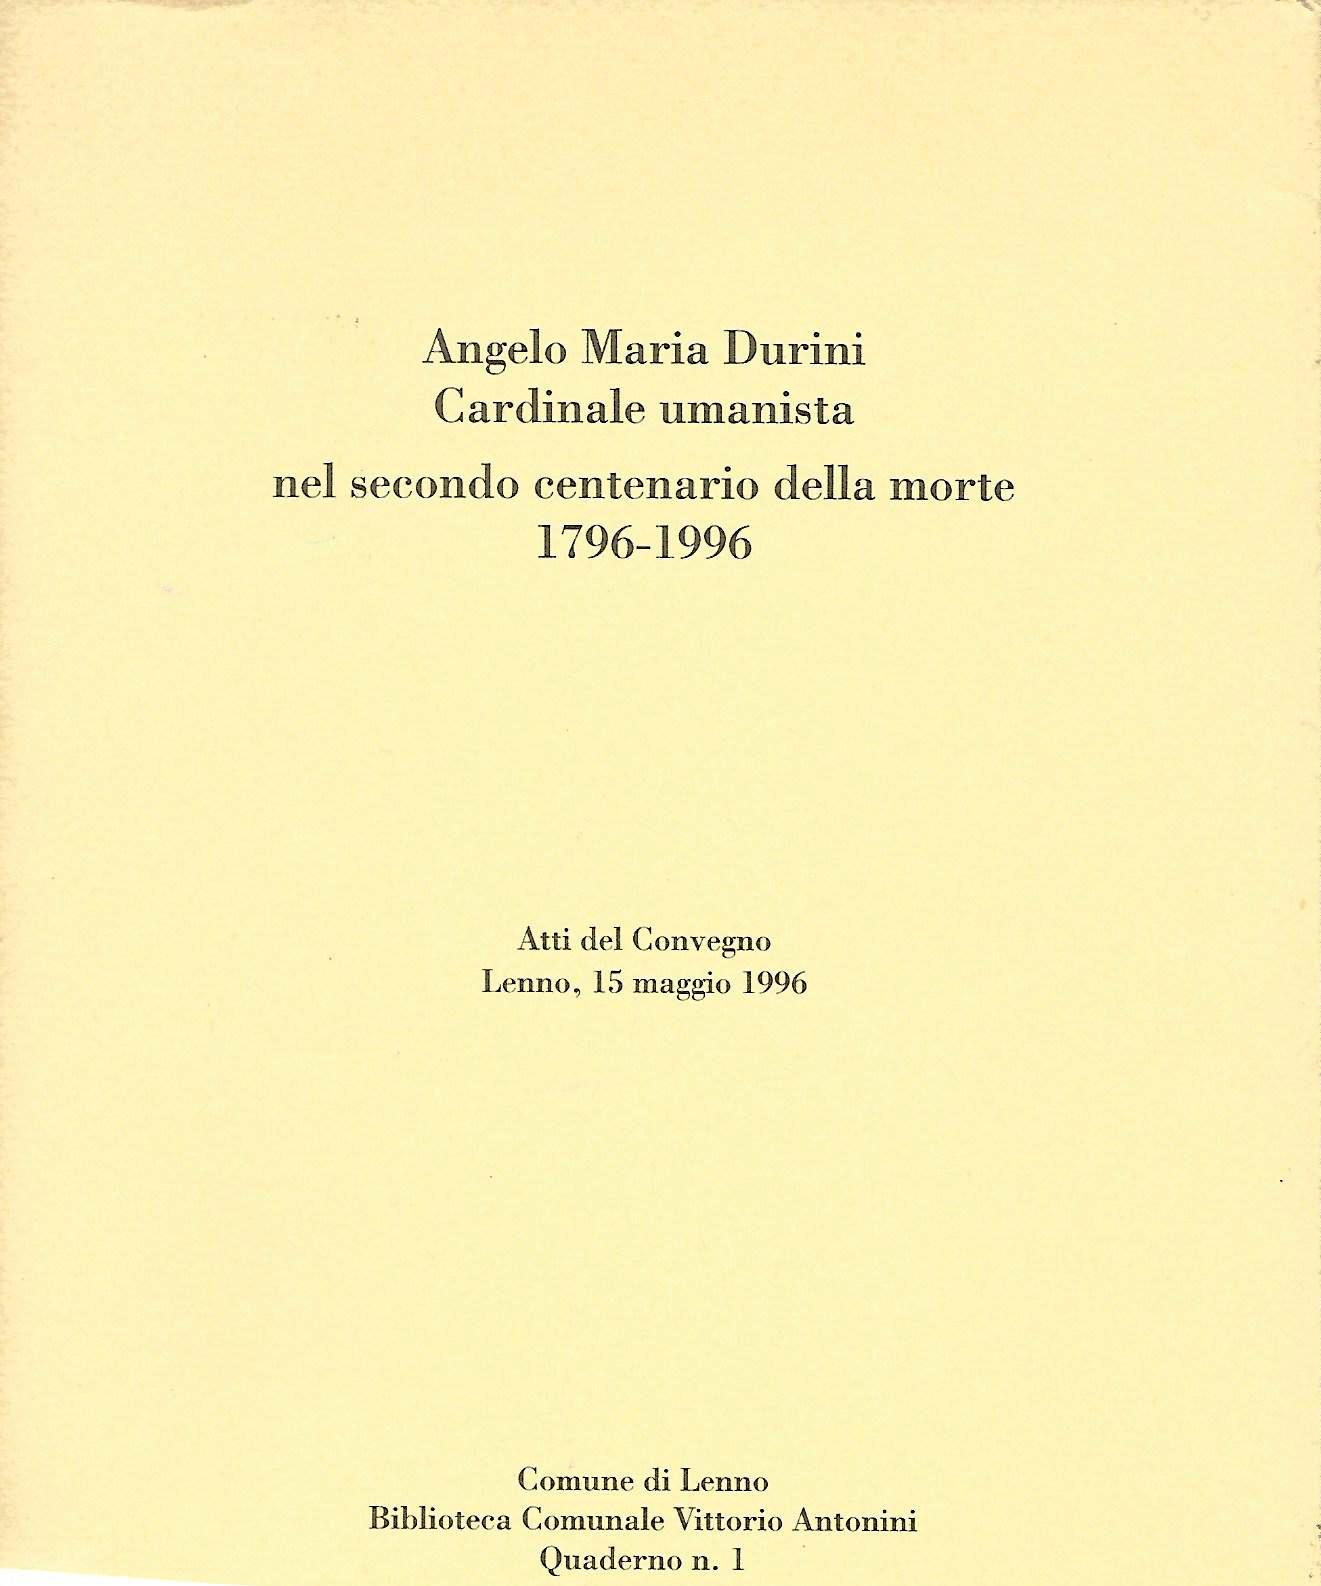 Angelo Maria Durini, cardinale umanista nel secondo centenario della morte 1796-1996